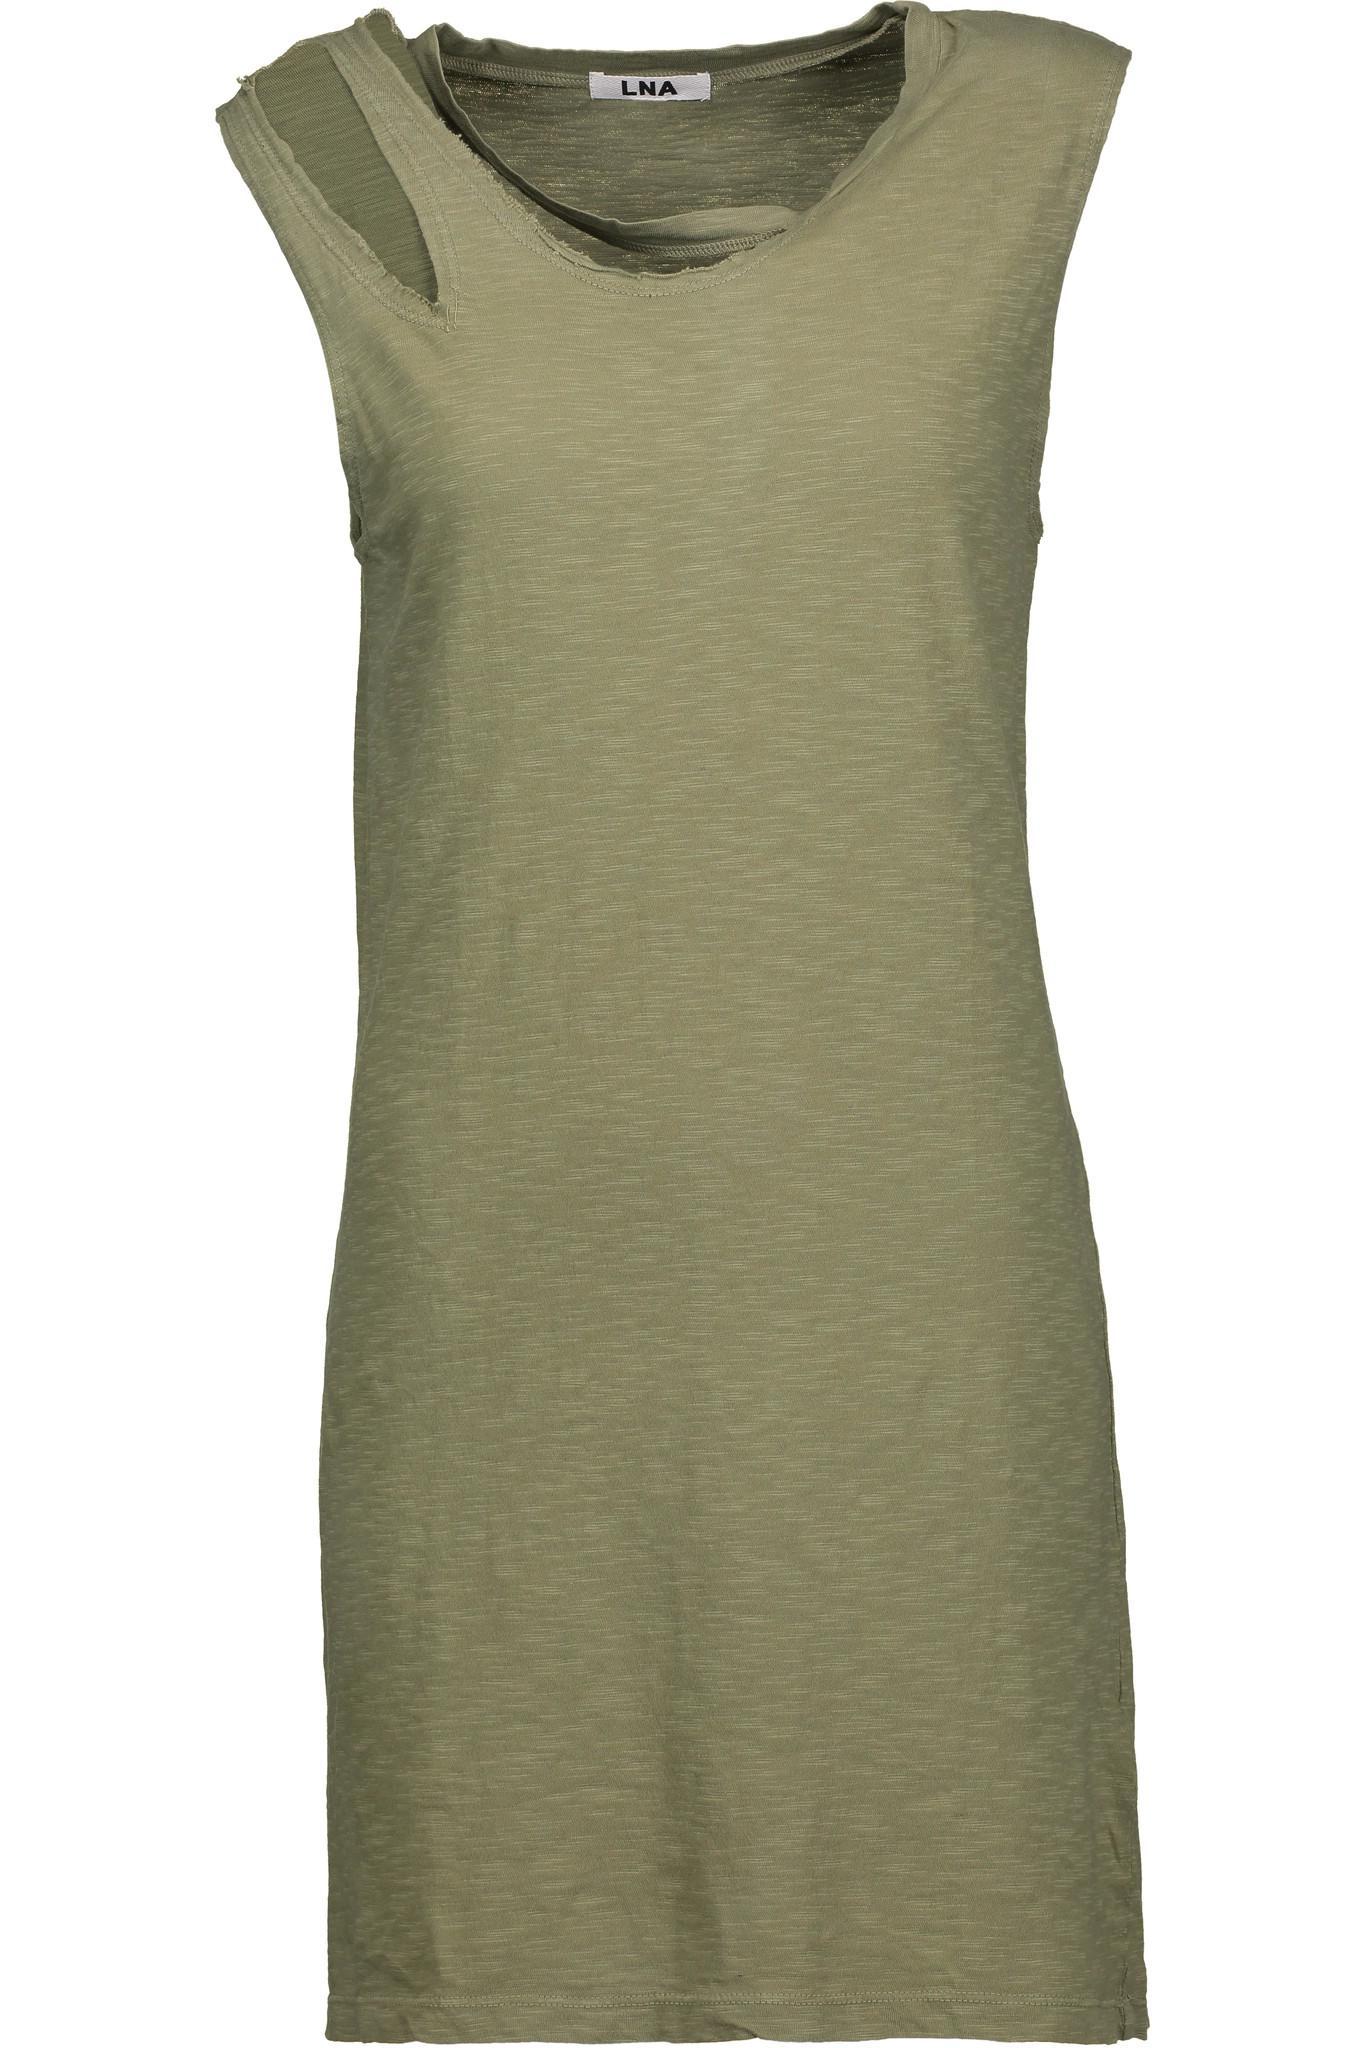 Lna Woman Cutout Mélange Cotton-blend Jersey Mini Dress Midnight Blue Size S LnA bEcTqD